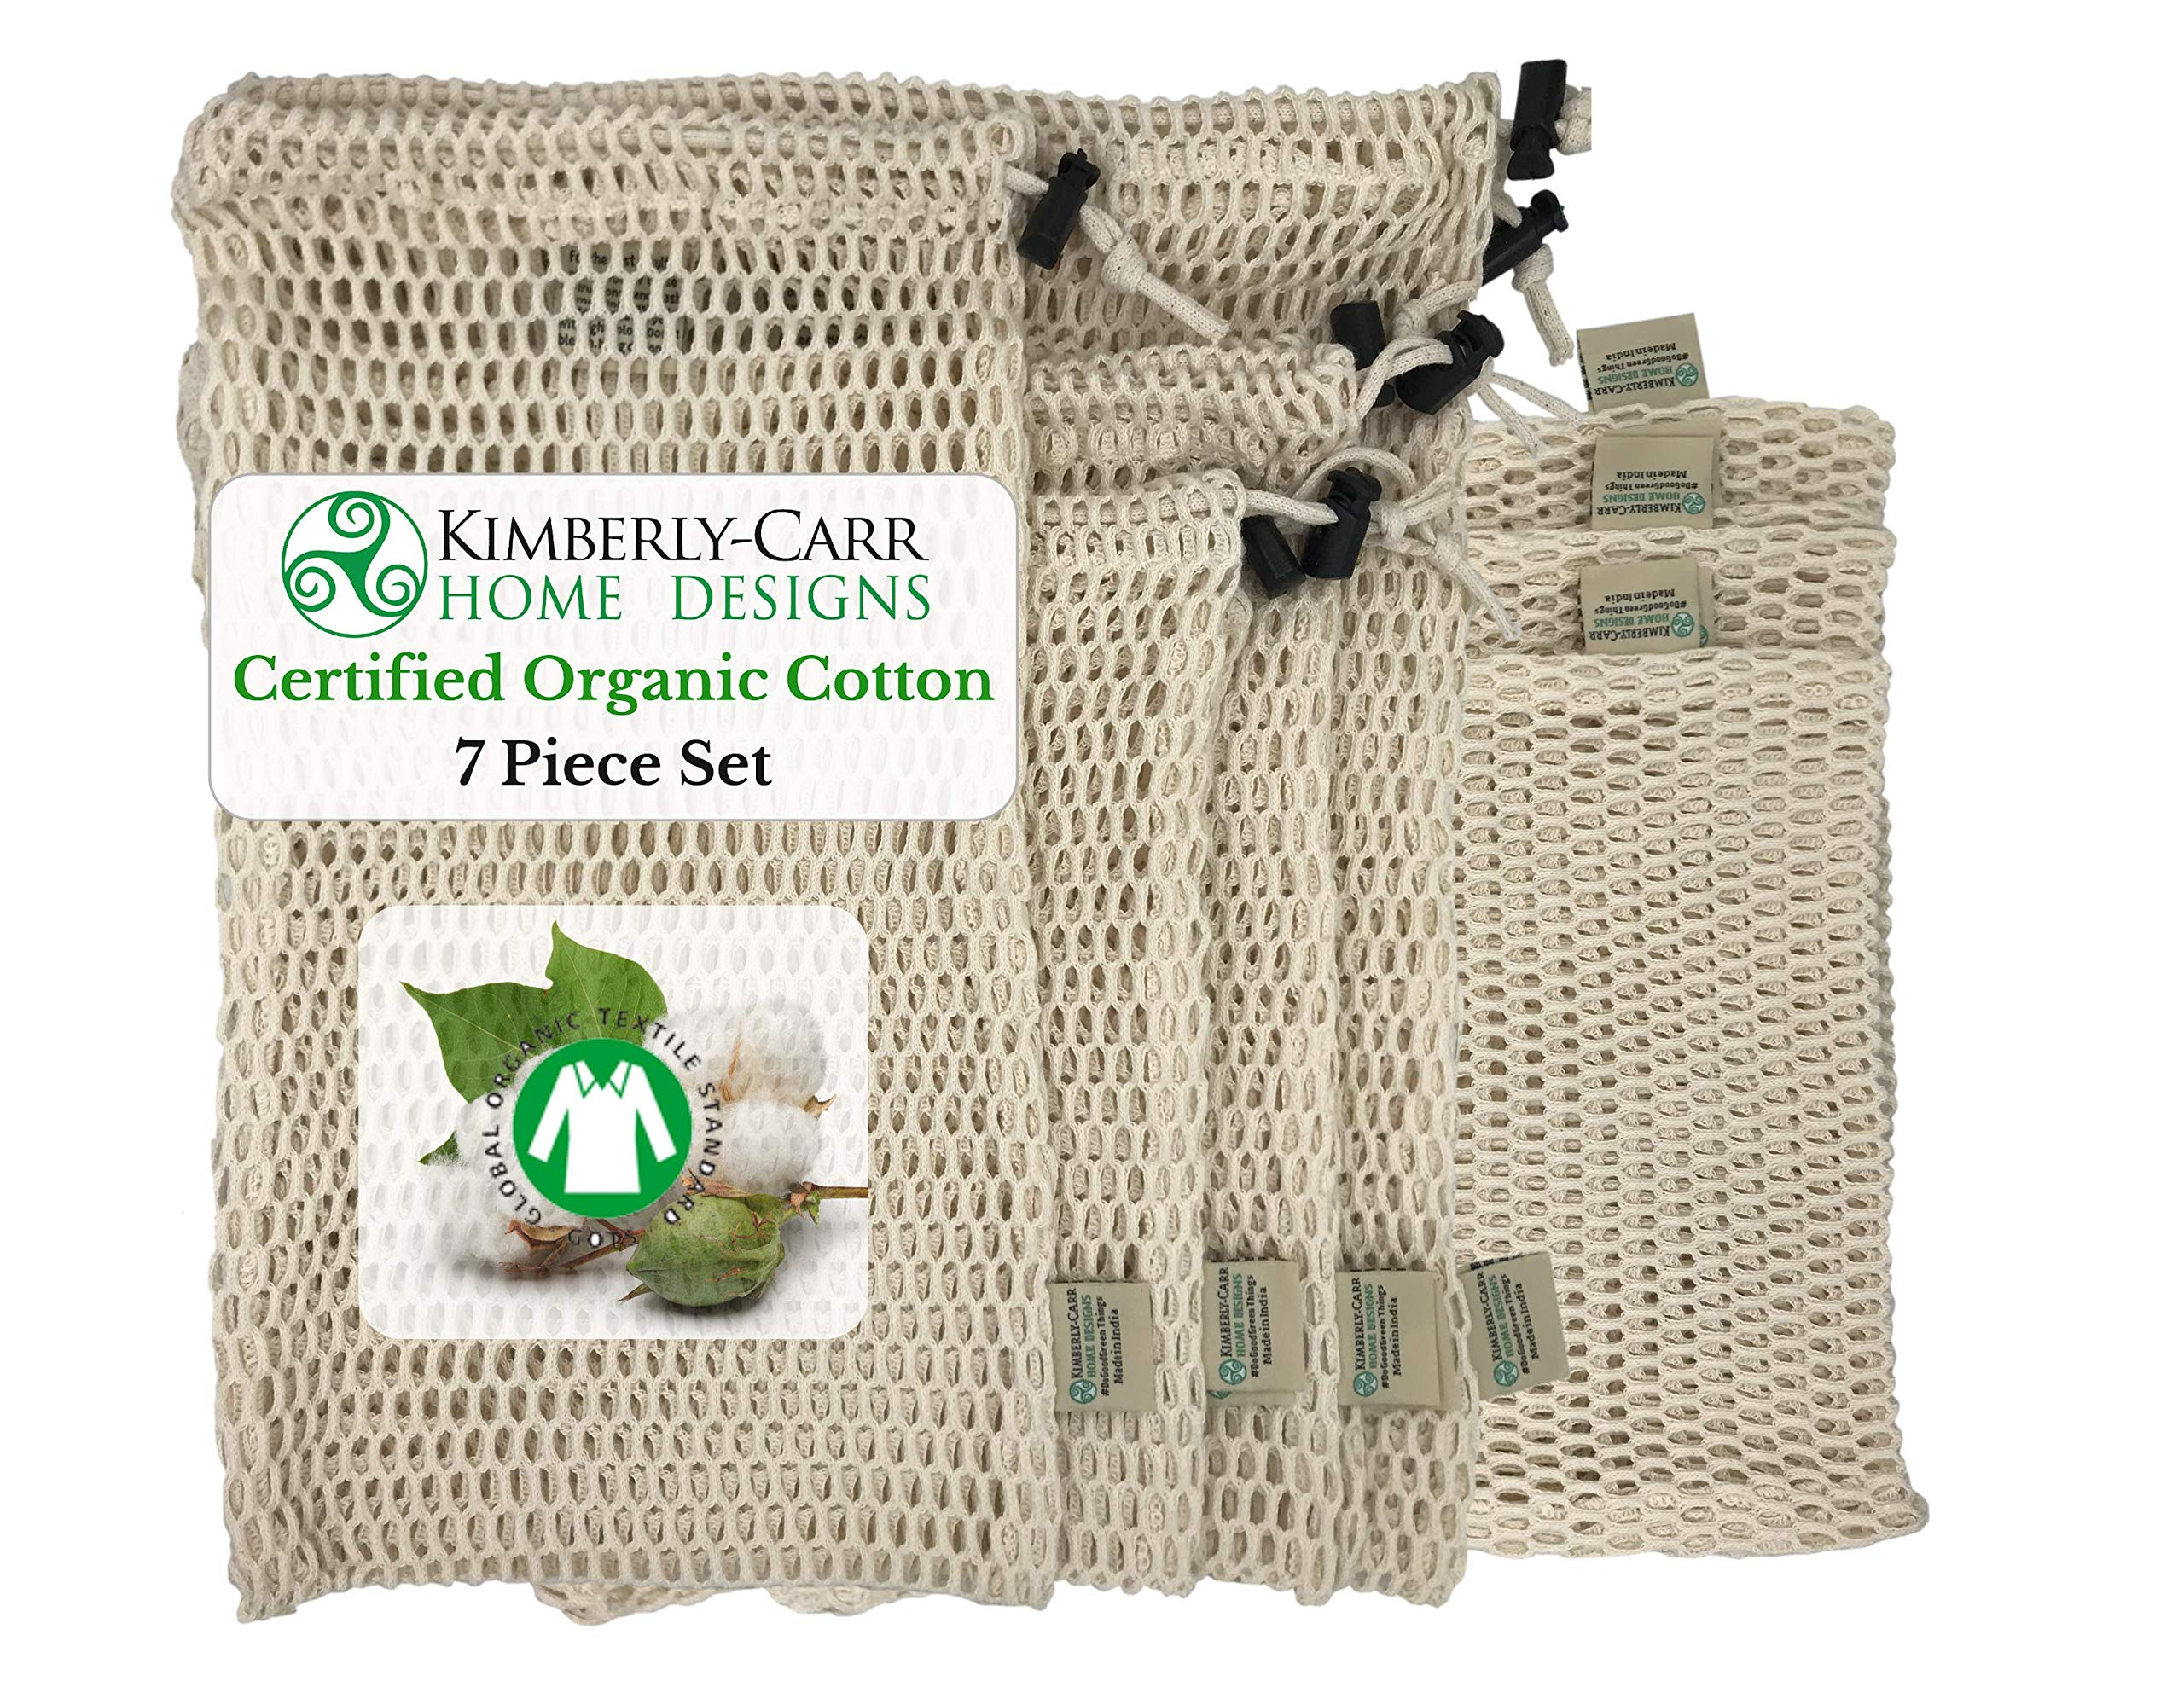 ZERO WASTE ORGANIC COTTON MESH REUSABLE PRODUCE BAG SET   Premium Washable Bags for Fresh Fruits & Vegetables   Compostable, Biodegradable   Sustainable Alternative to Plastic Bags   4 Sizes   7 Bags